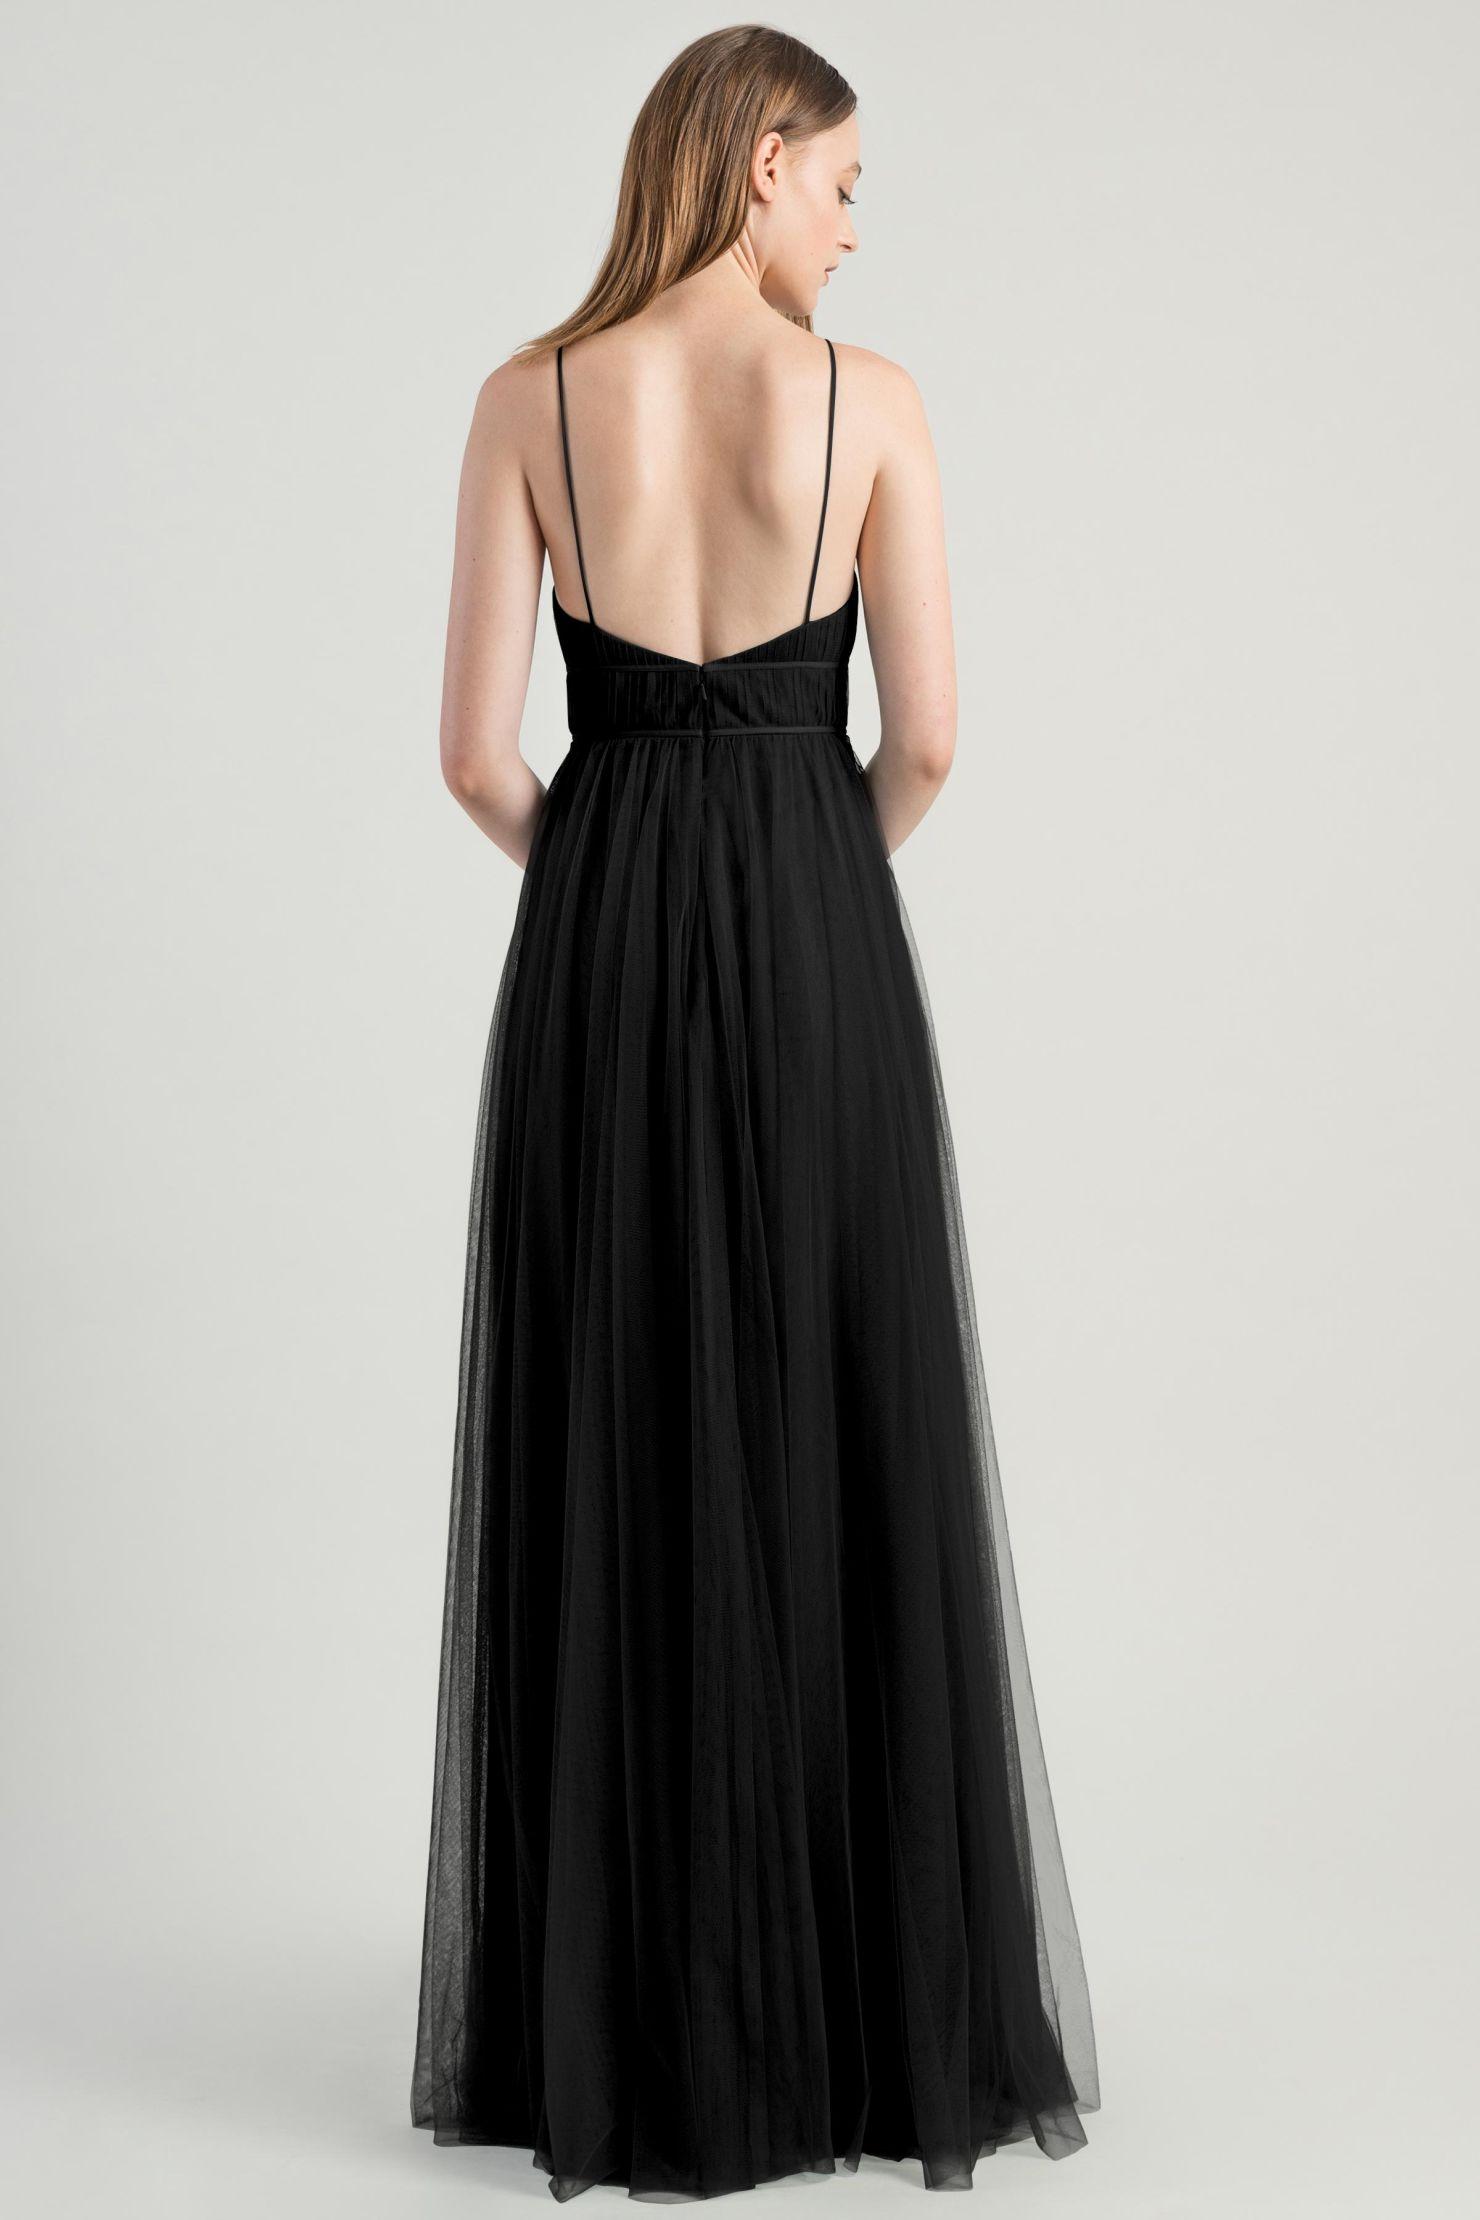 Ali Bridesmaids Dress by Jenny Yoo - Onyx